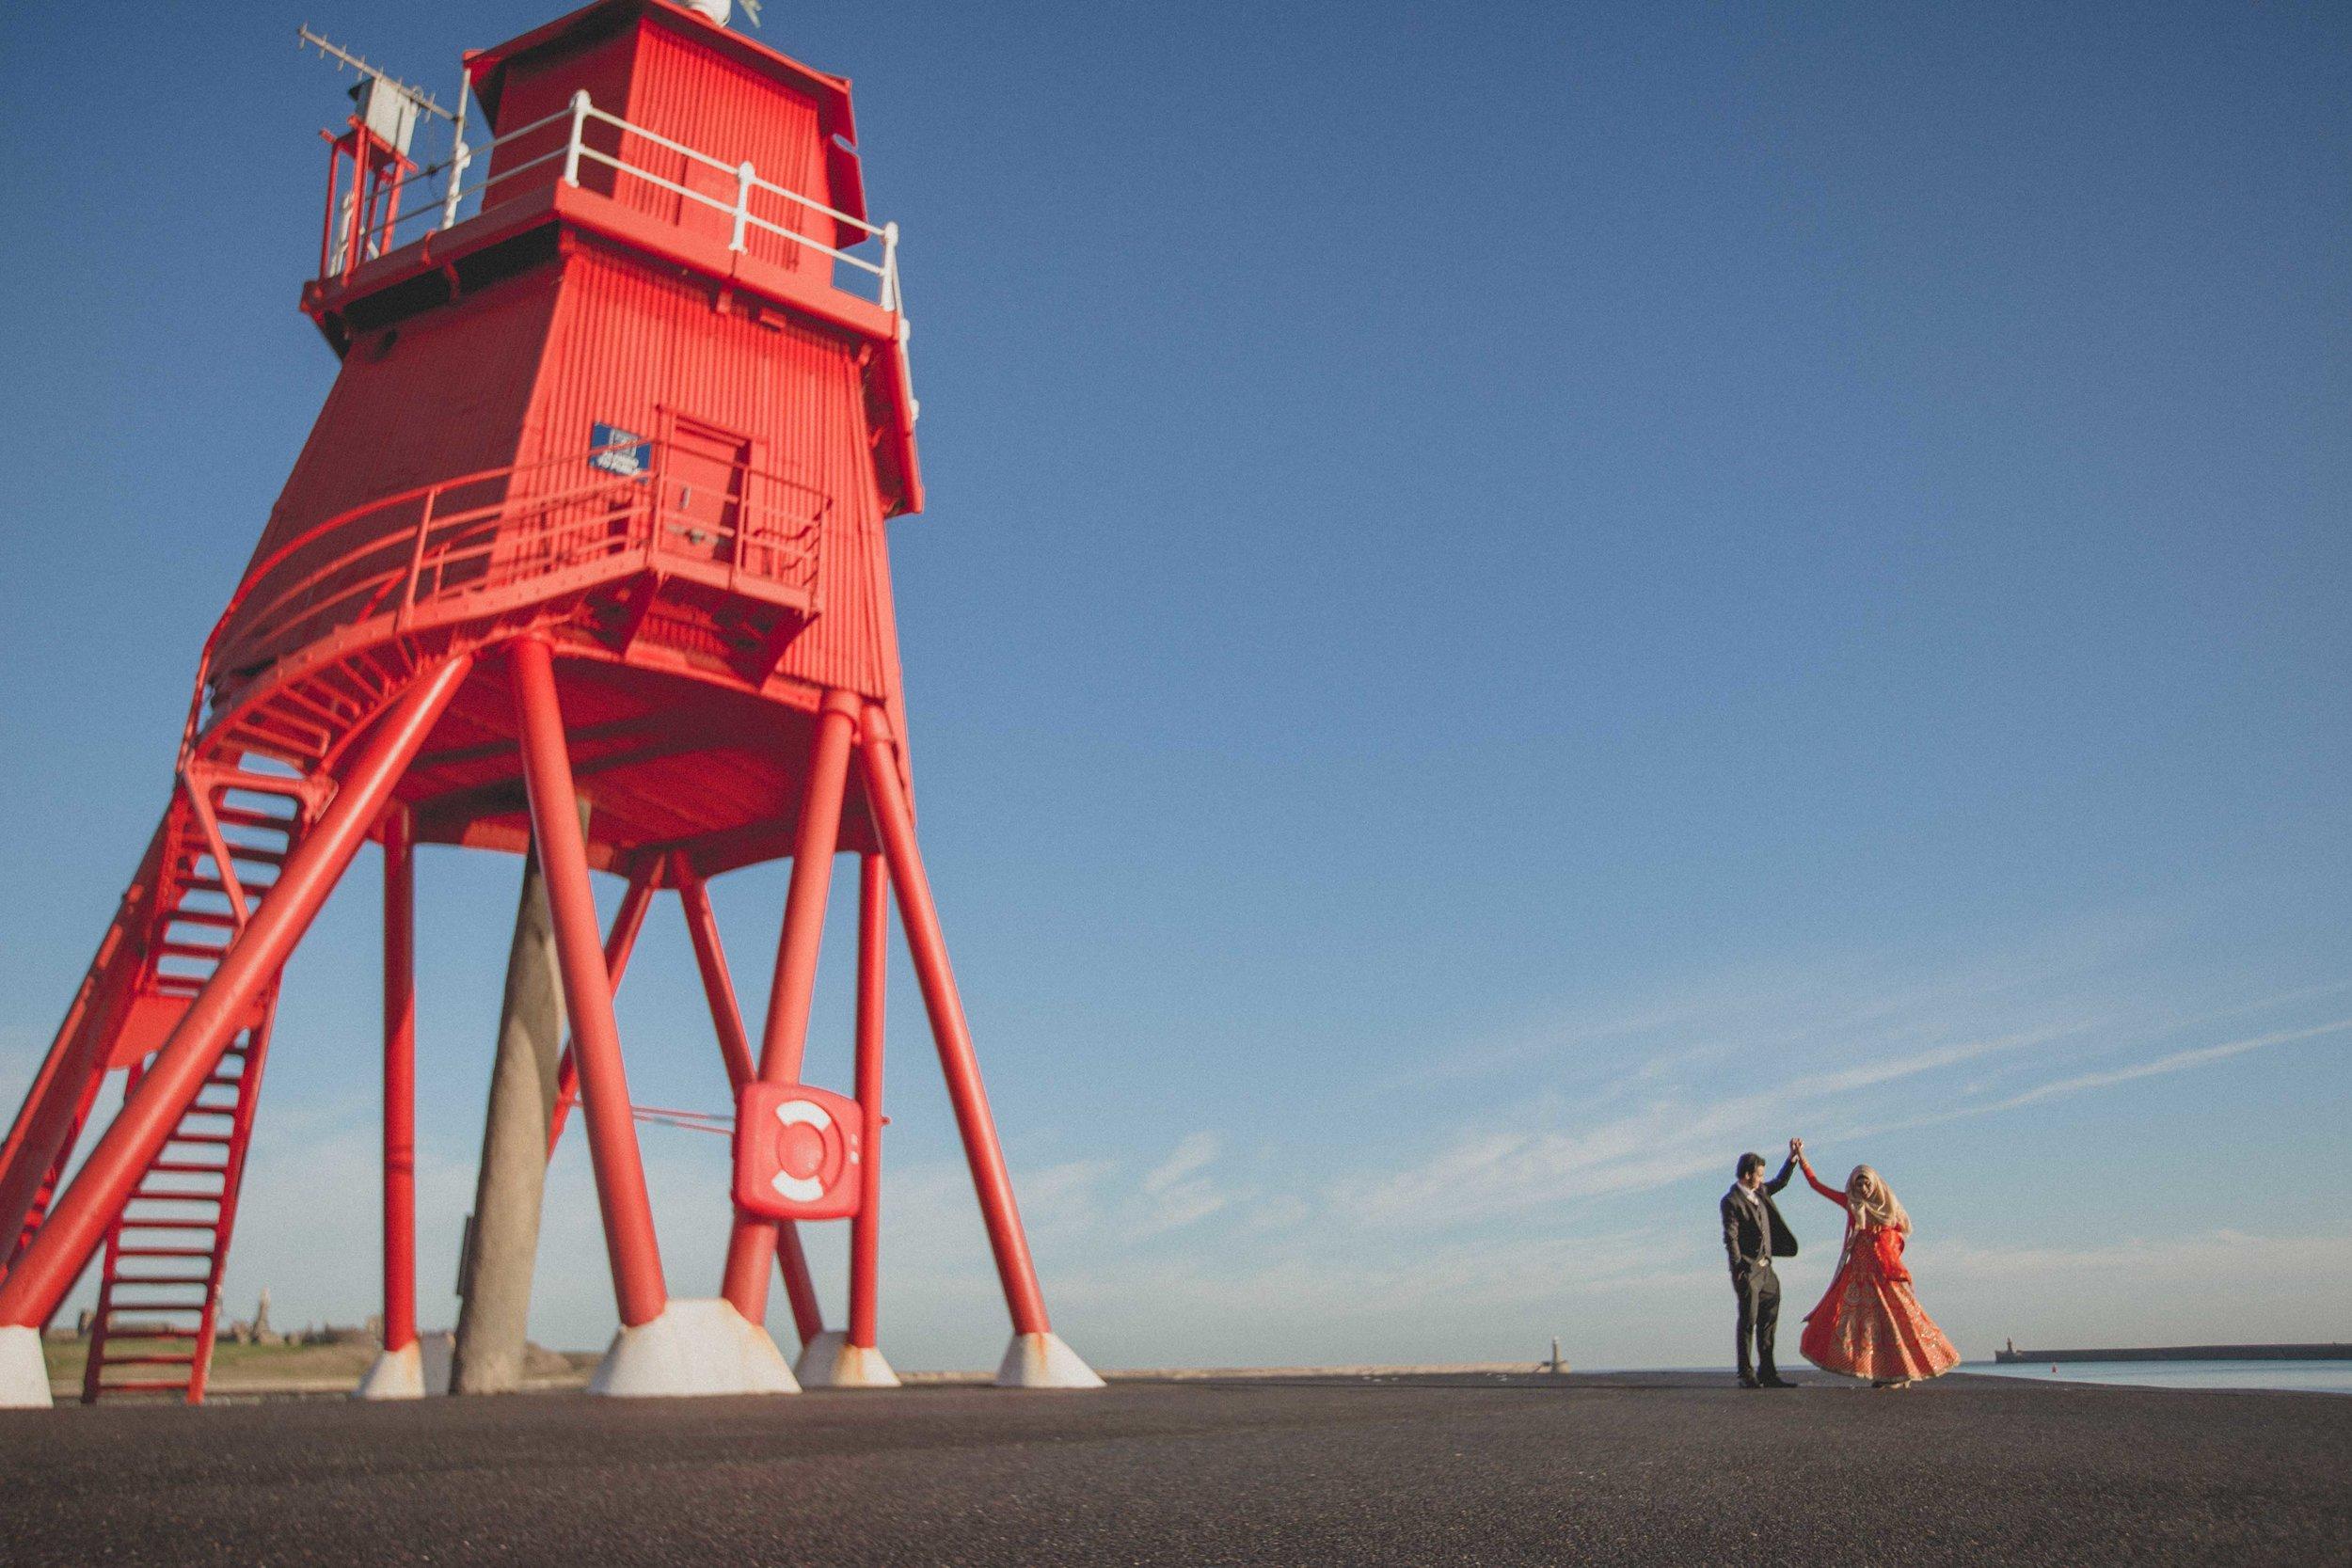 newcastle-beach-lighthouse-couple-prewedding-pre-wedding-shoot-asian-wedding-photographer-natalia-smith-photography-16.jpg